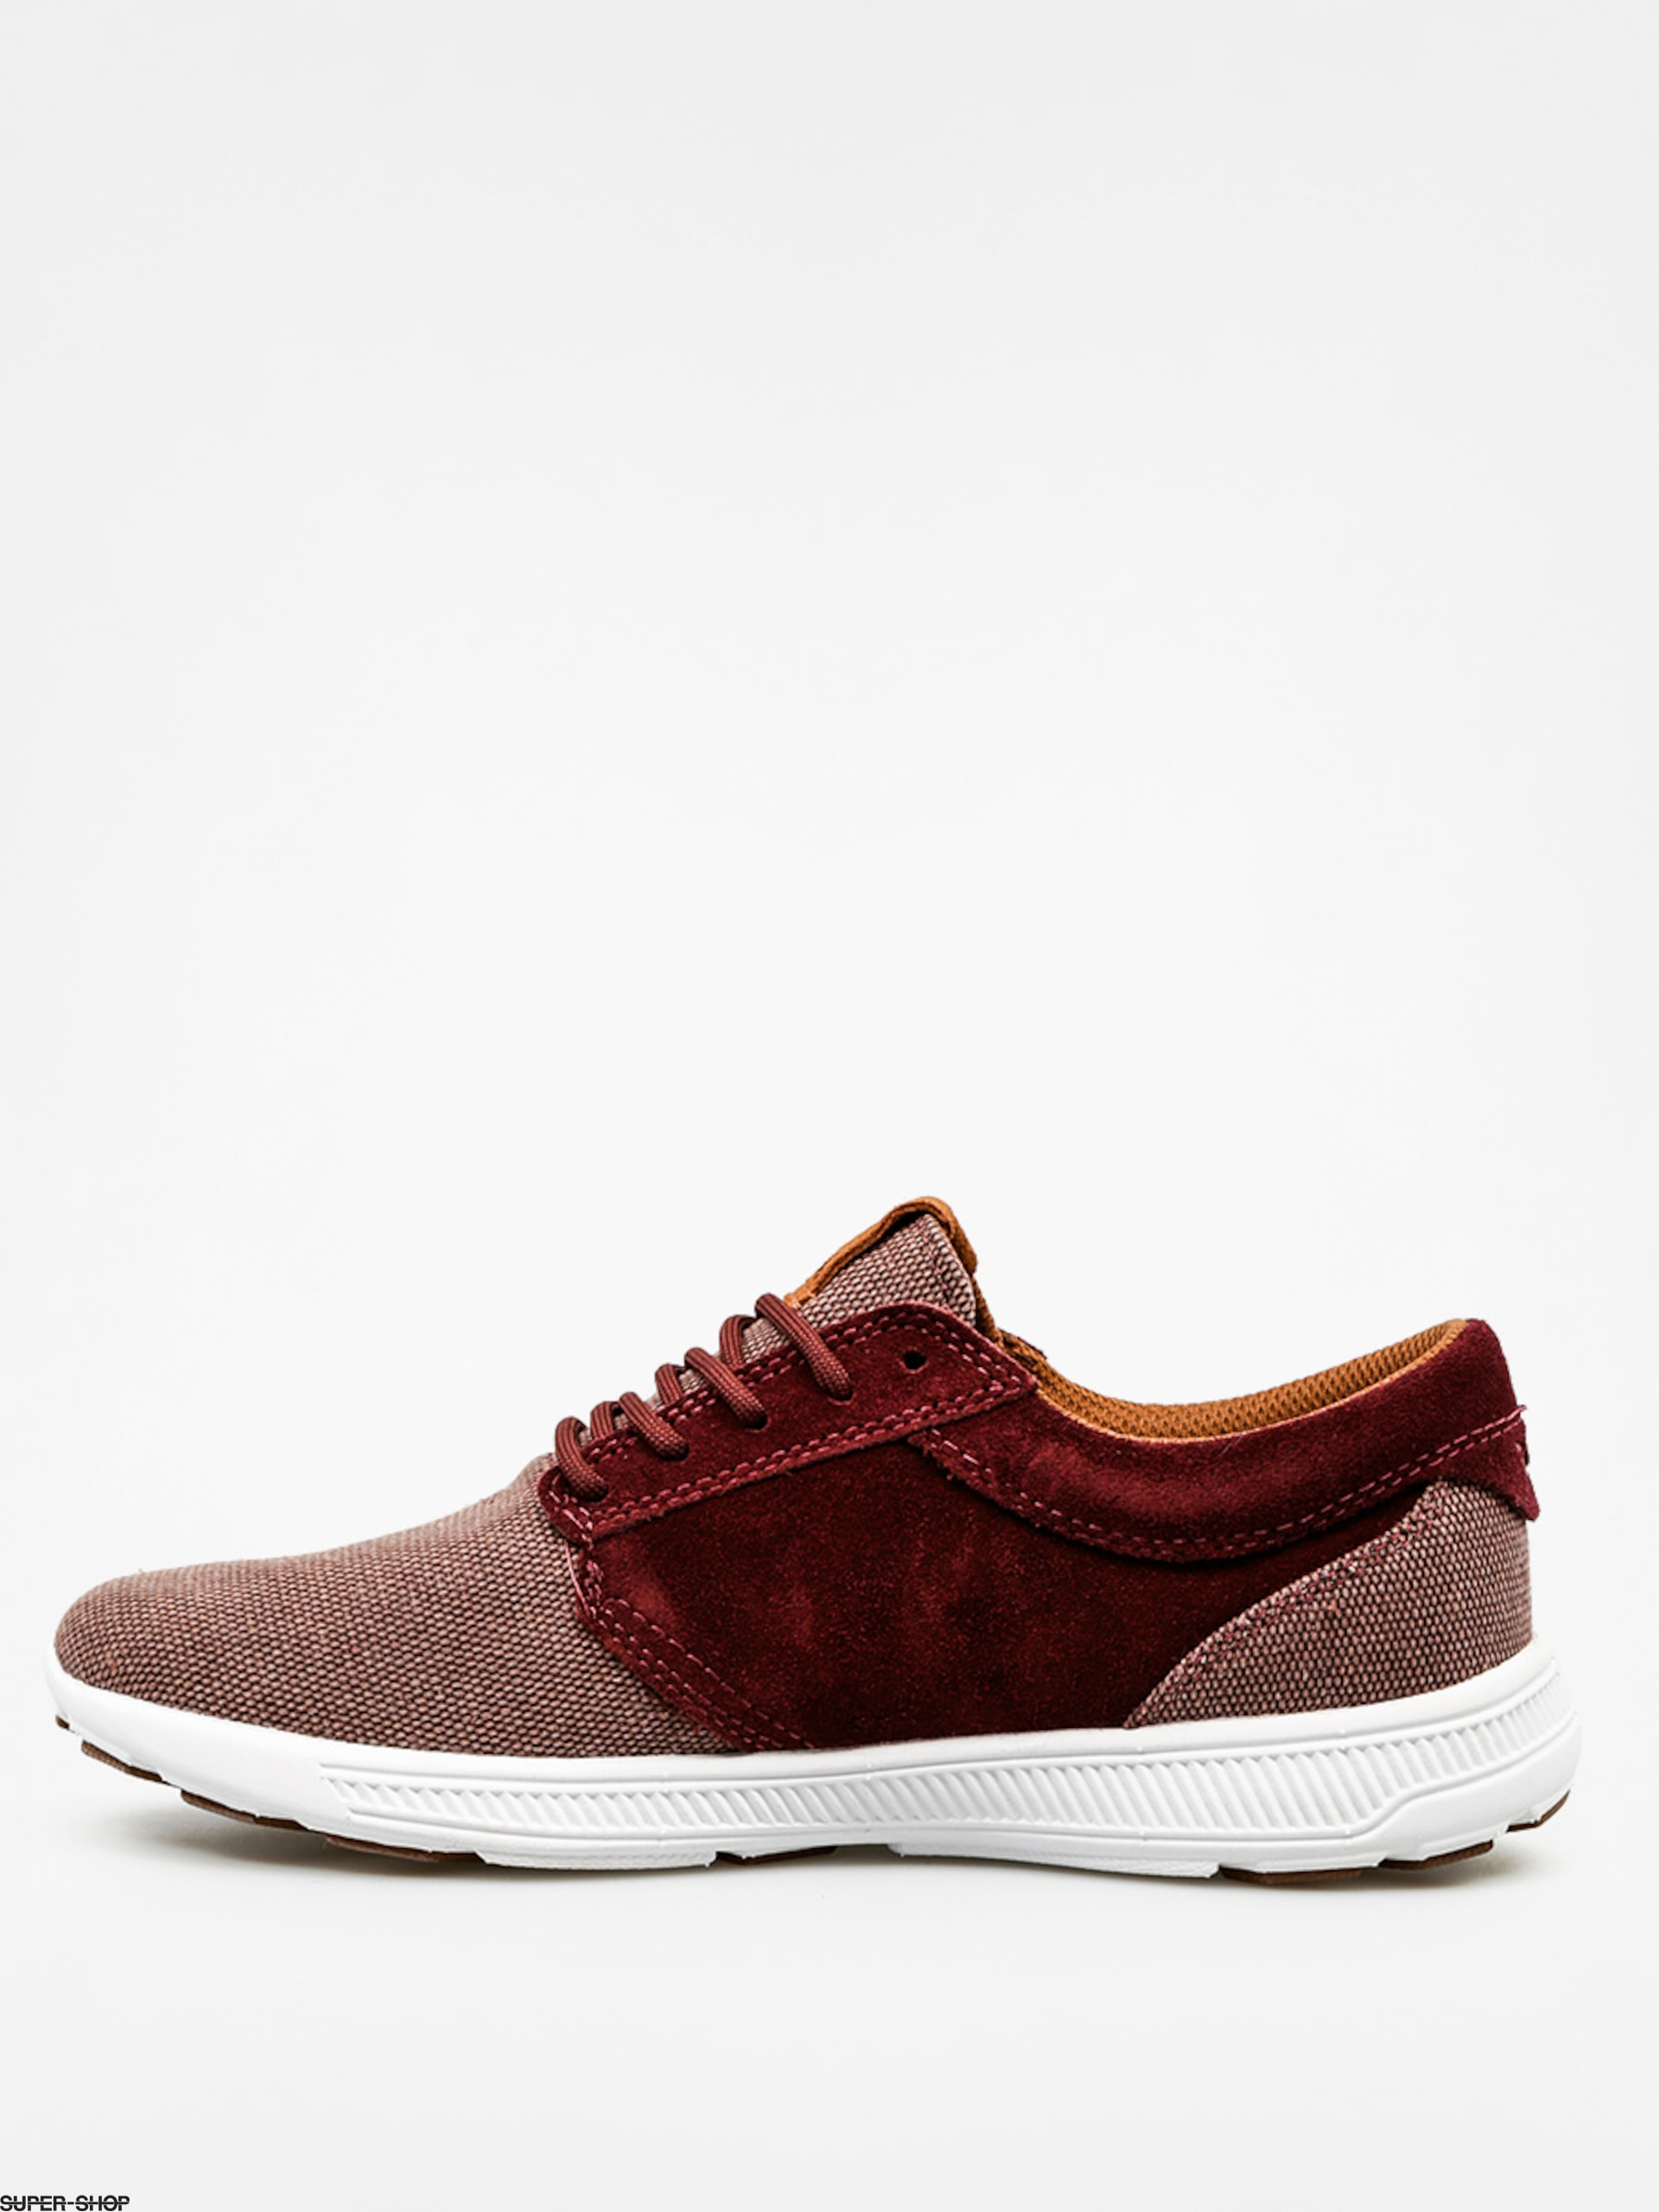 8b89423ba0f2 Supra Shoes Hammer Run Nonstrtch (burgundy brown white)